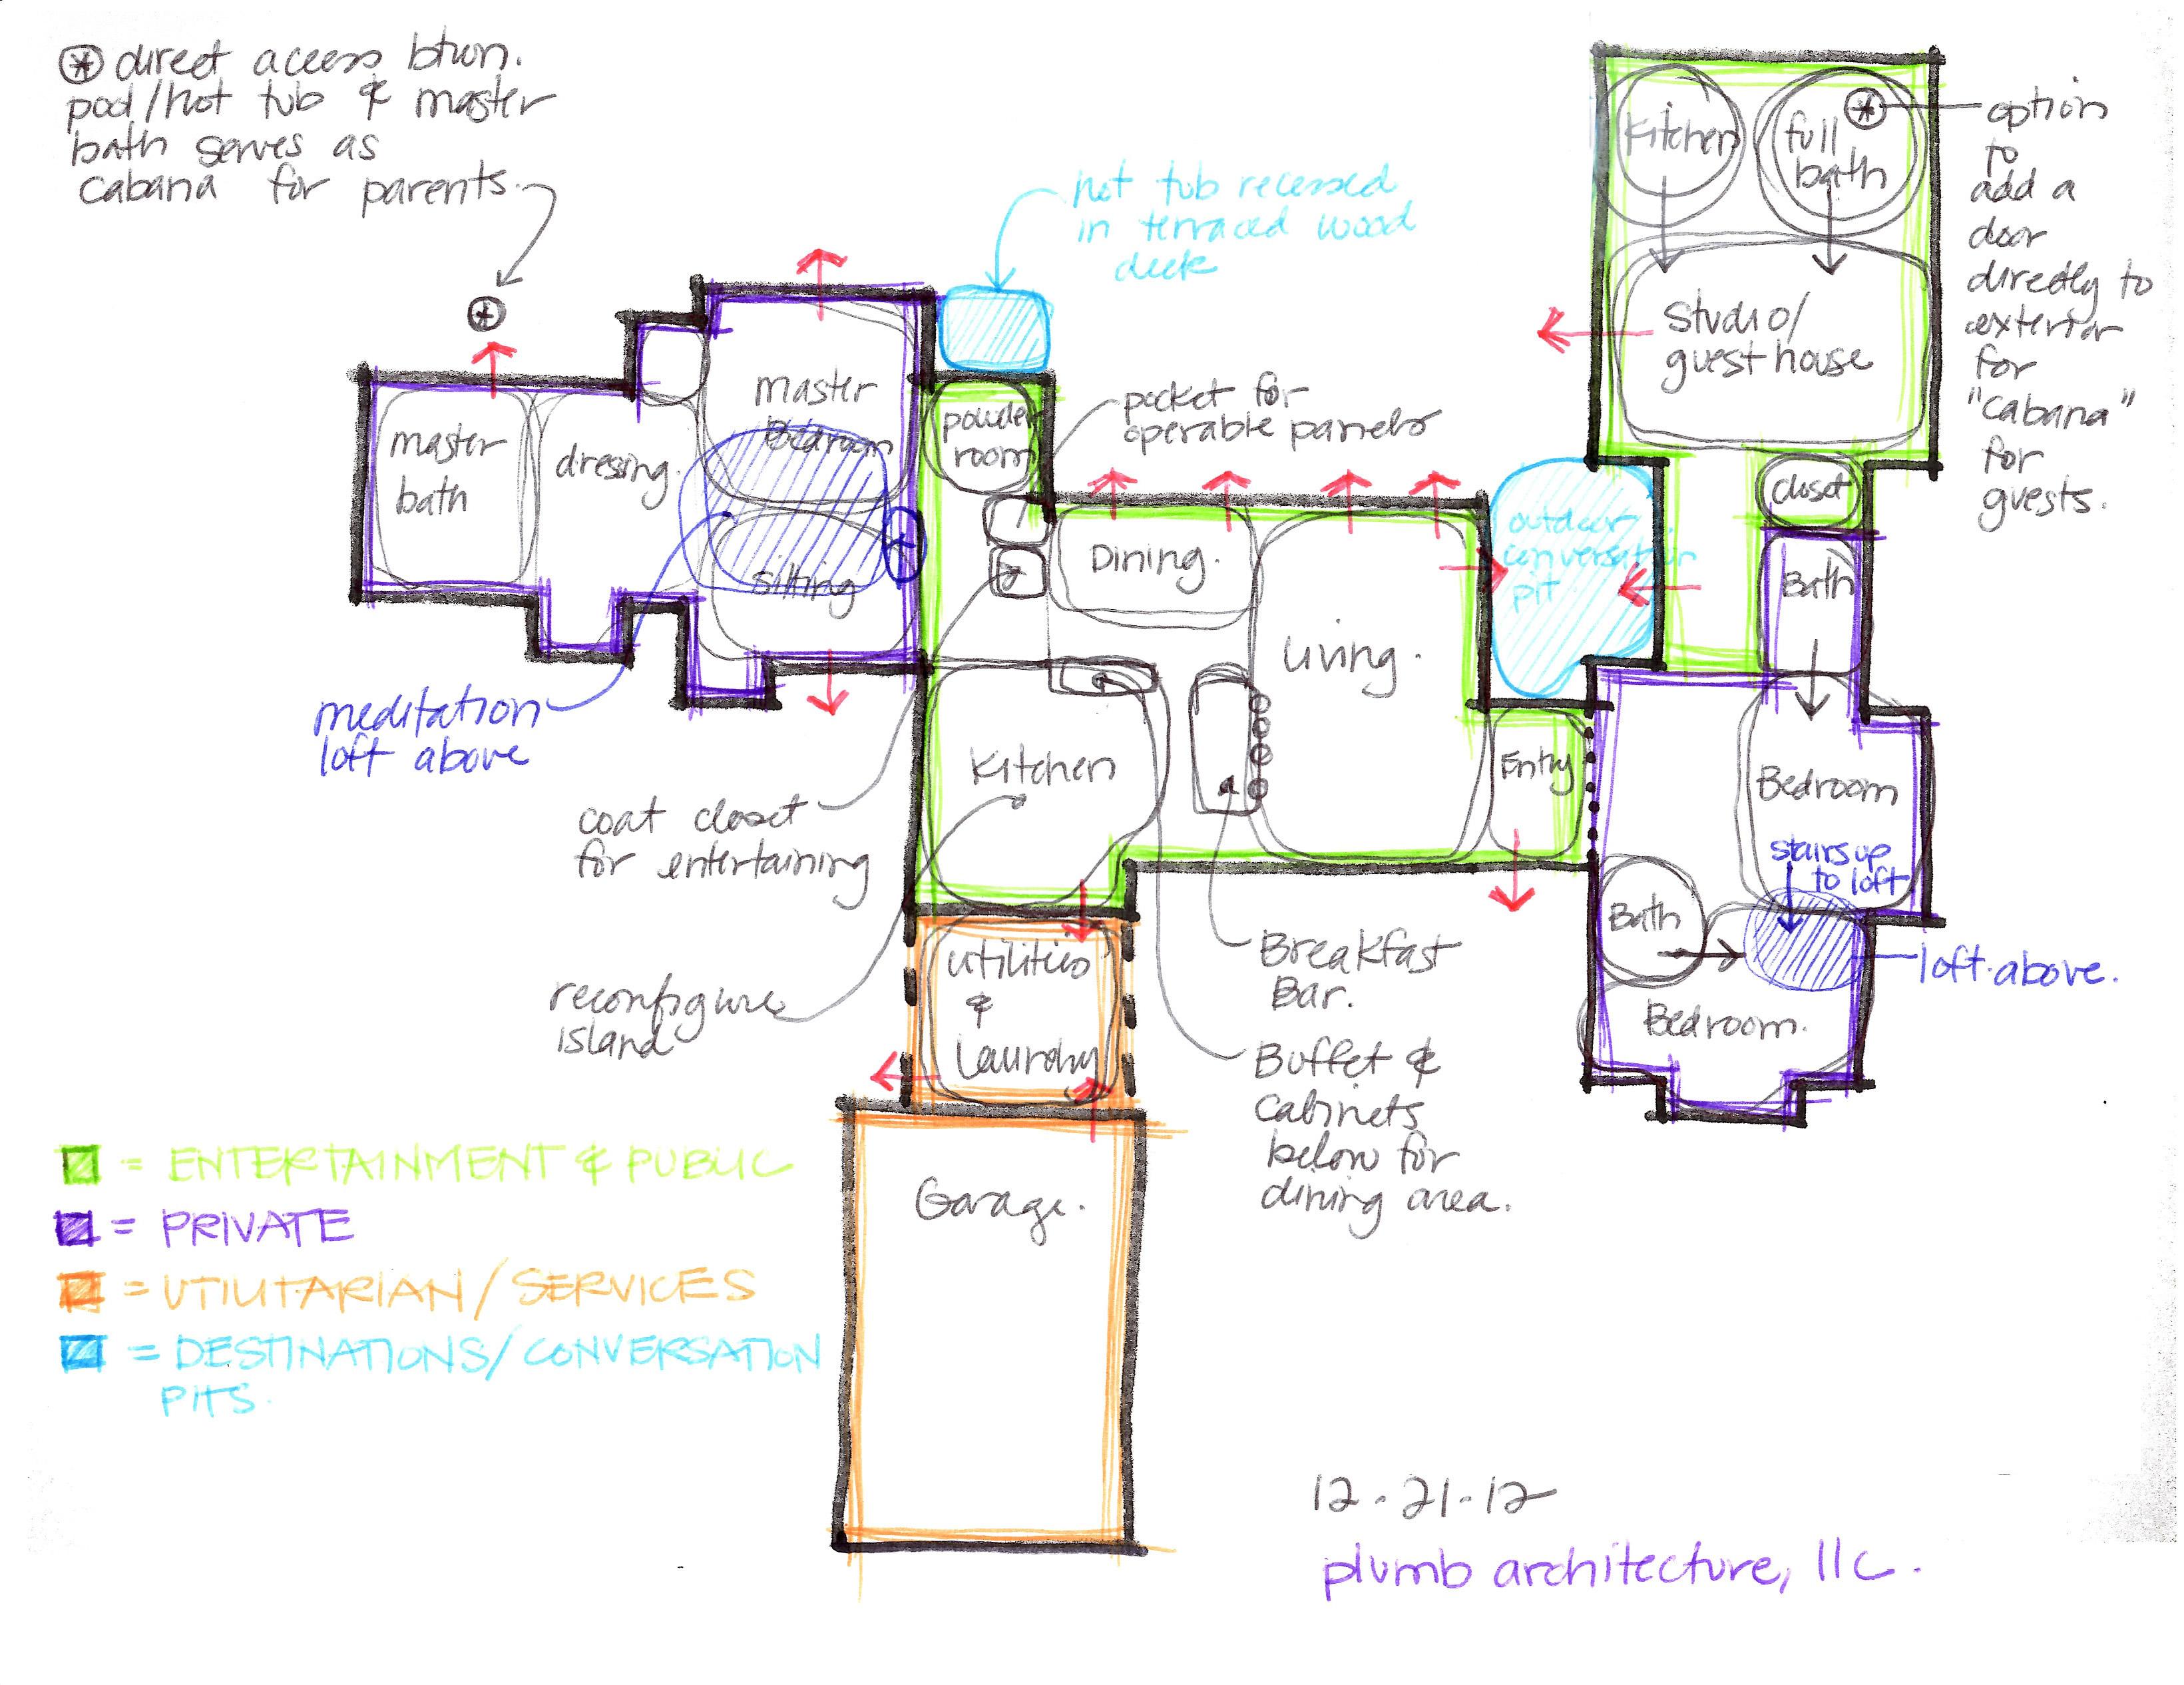 Plumb architecture llc rob roy renovation for Conceptual architecture diagram